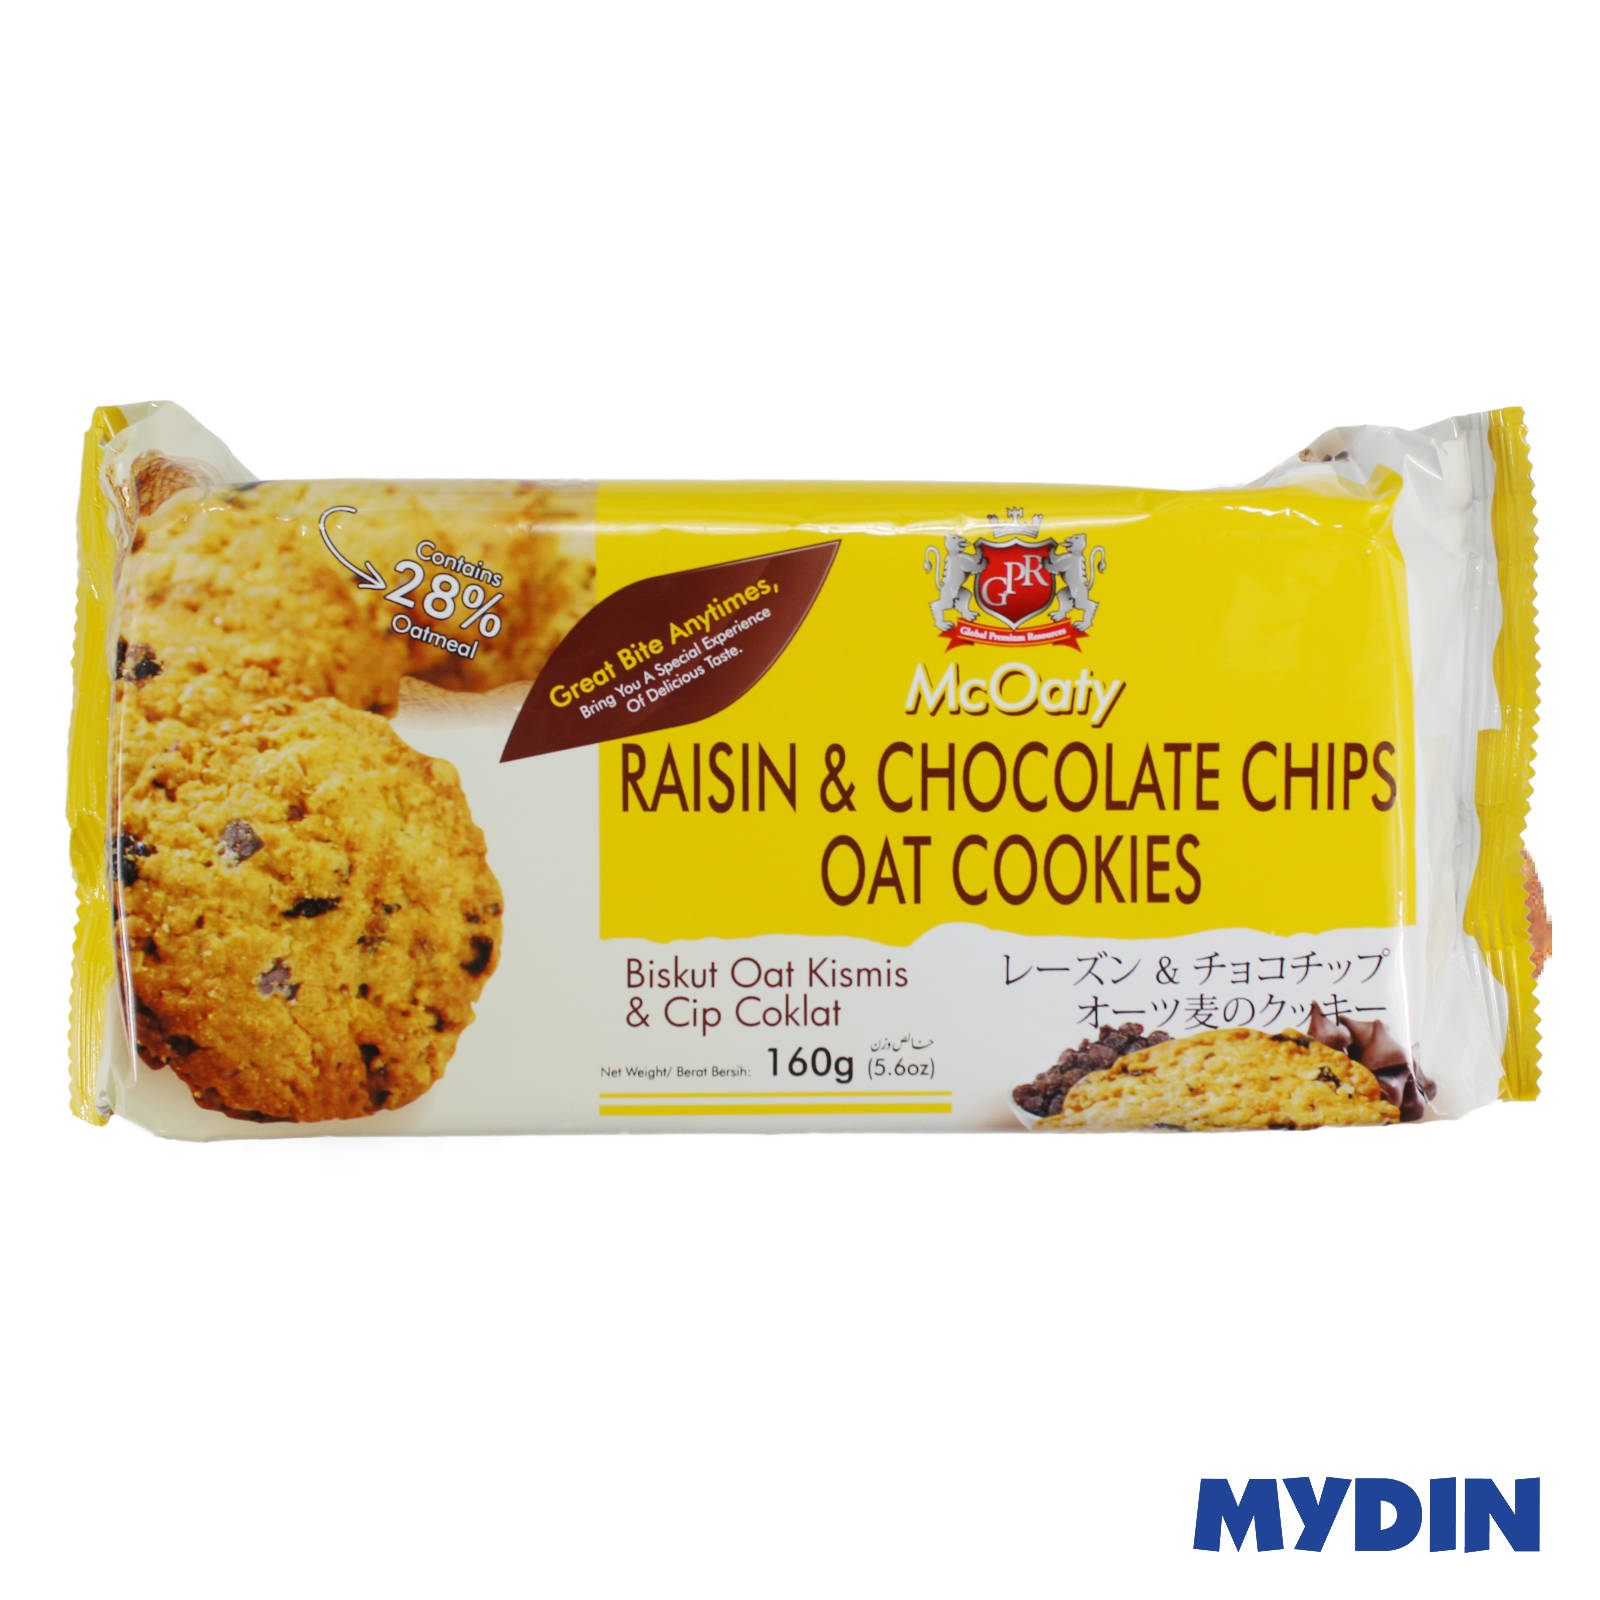 GPR McOaty Raisin & Chocolate Chips Oat Cookies 160g